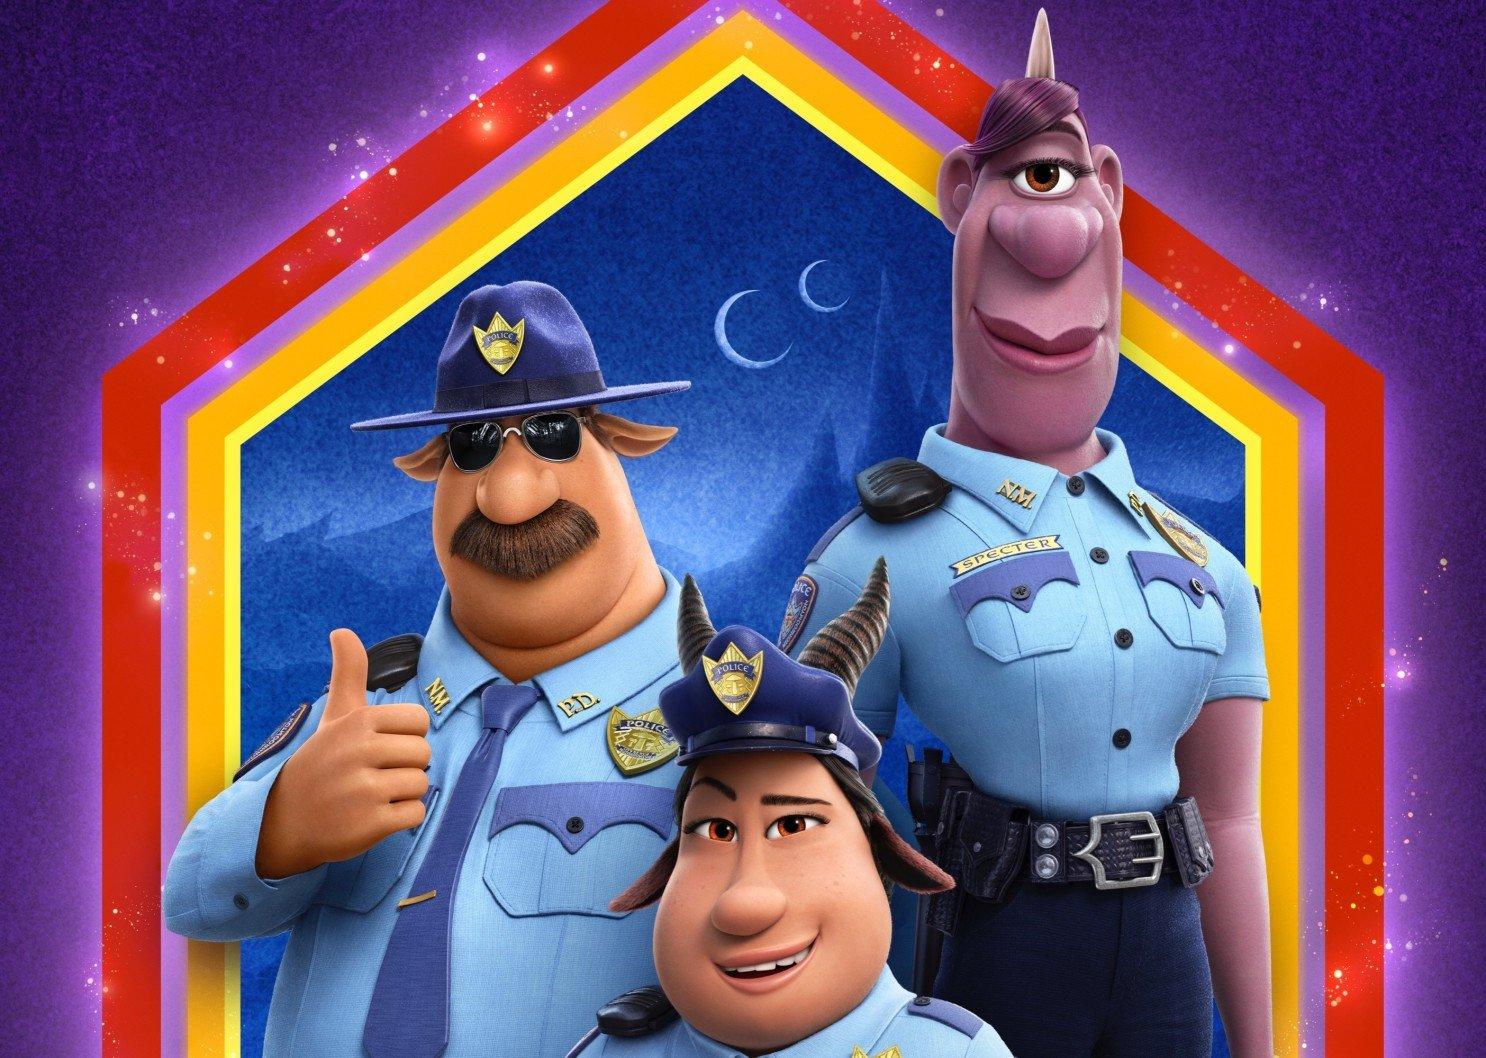 Os policiais